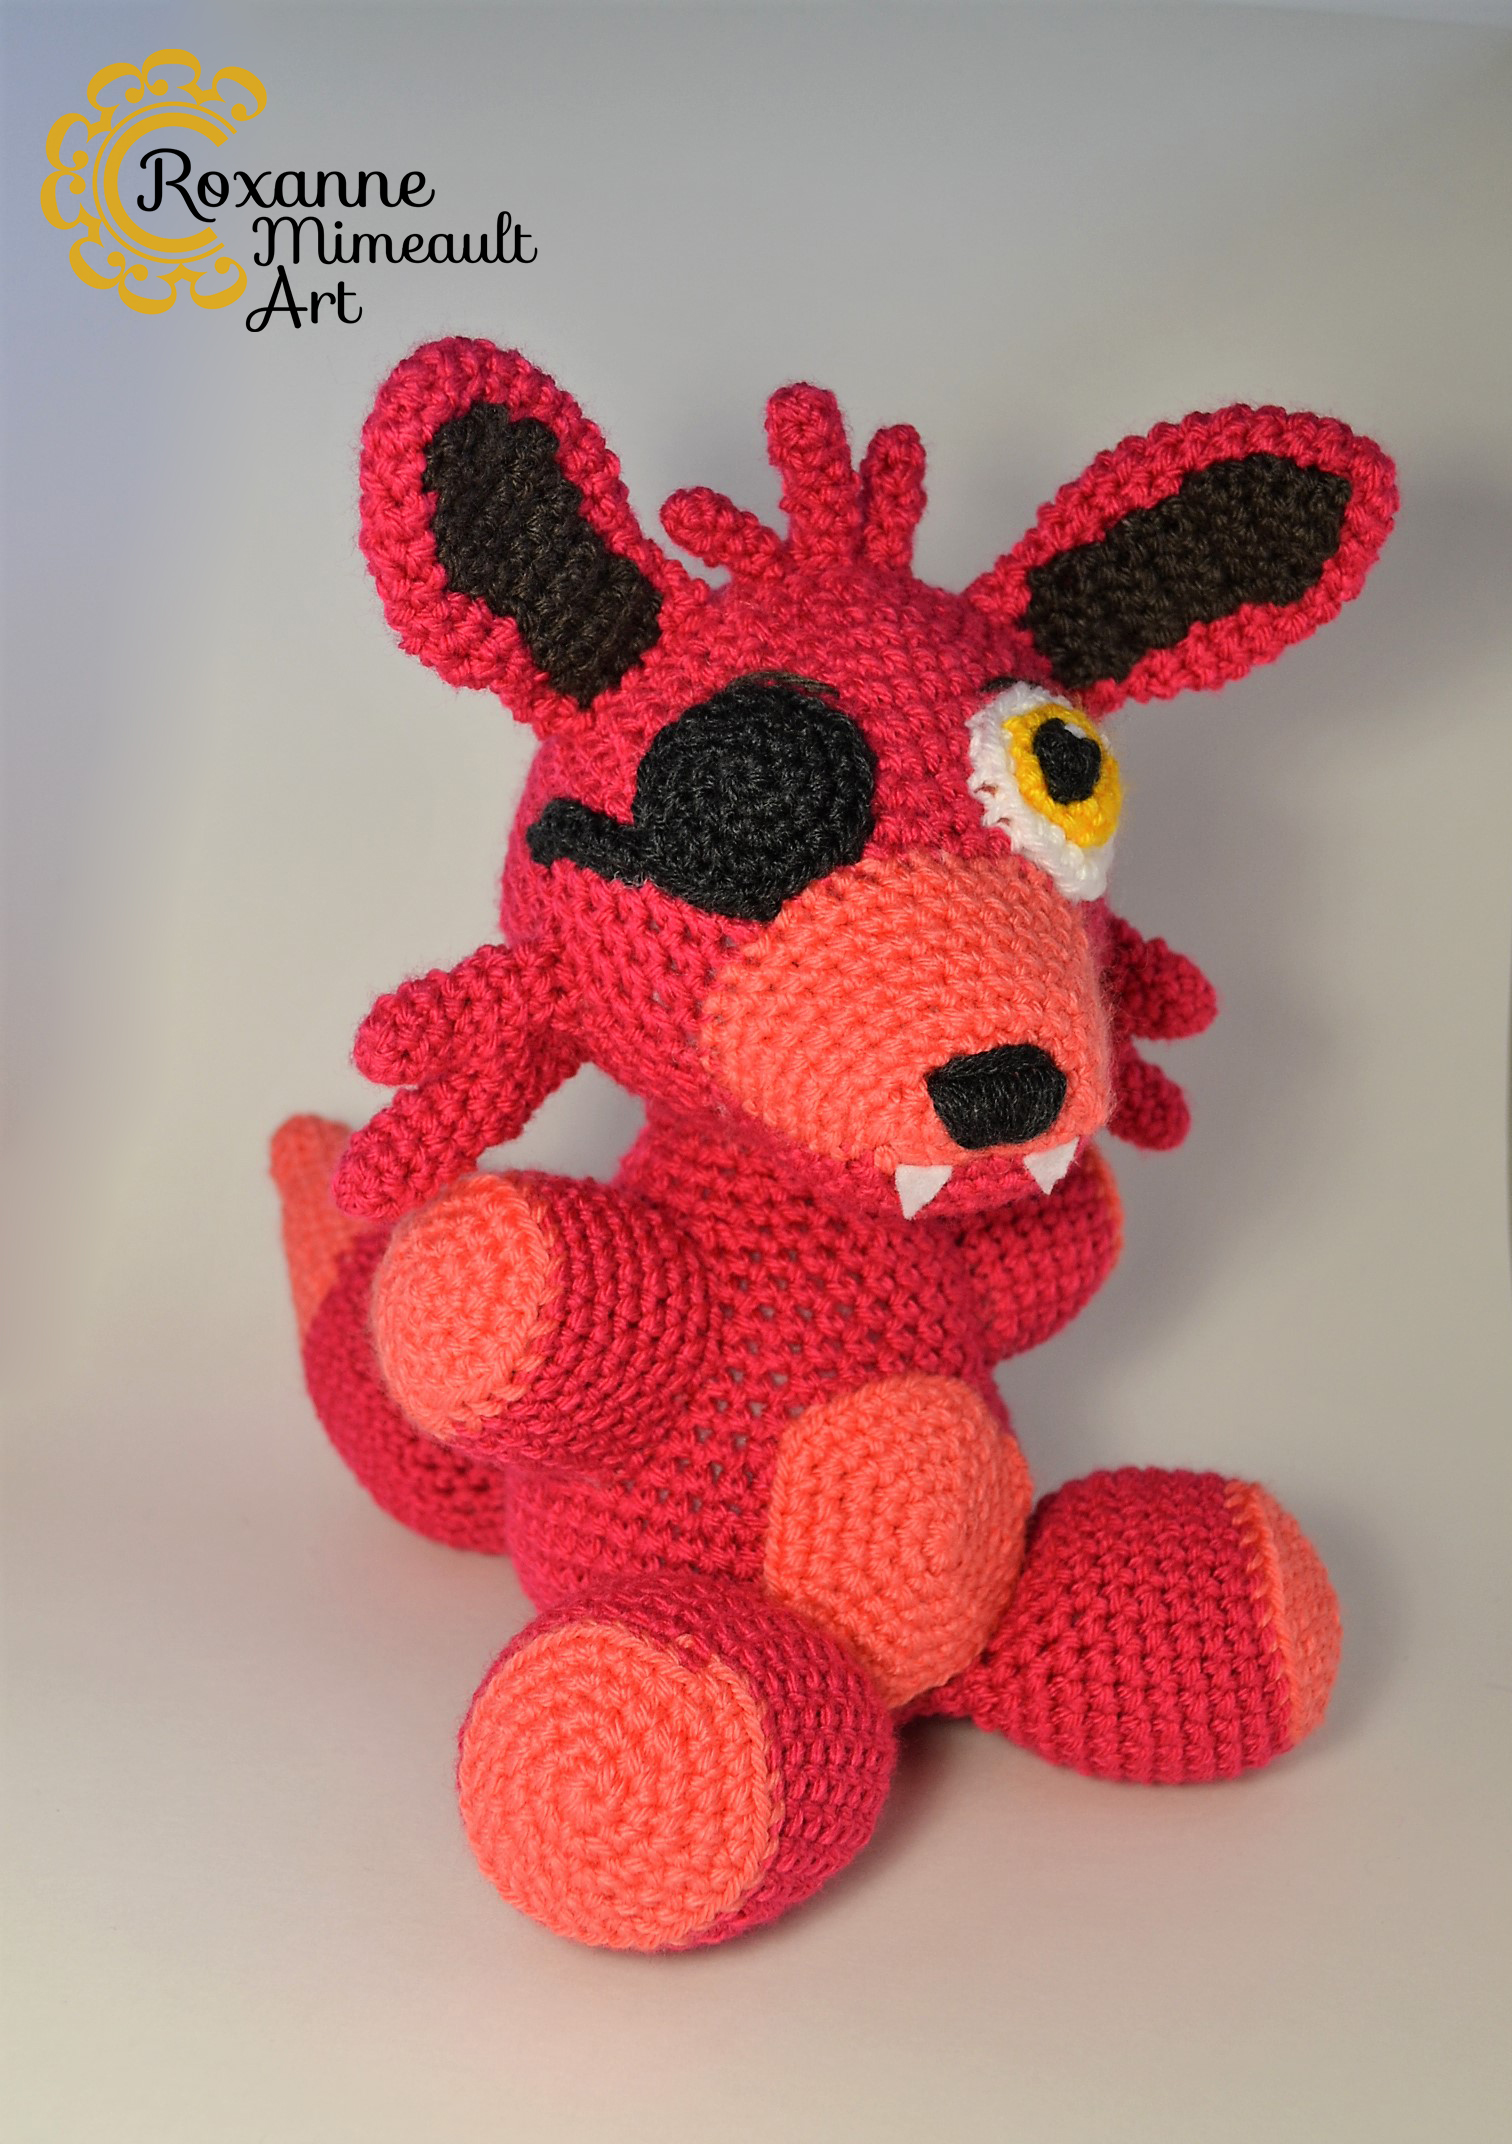 Forest Friends: Amigurumi Crochet Pattern | 2144x1512